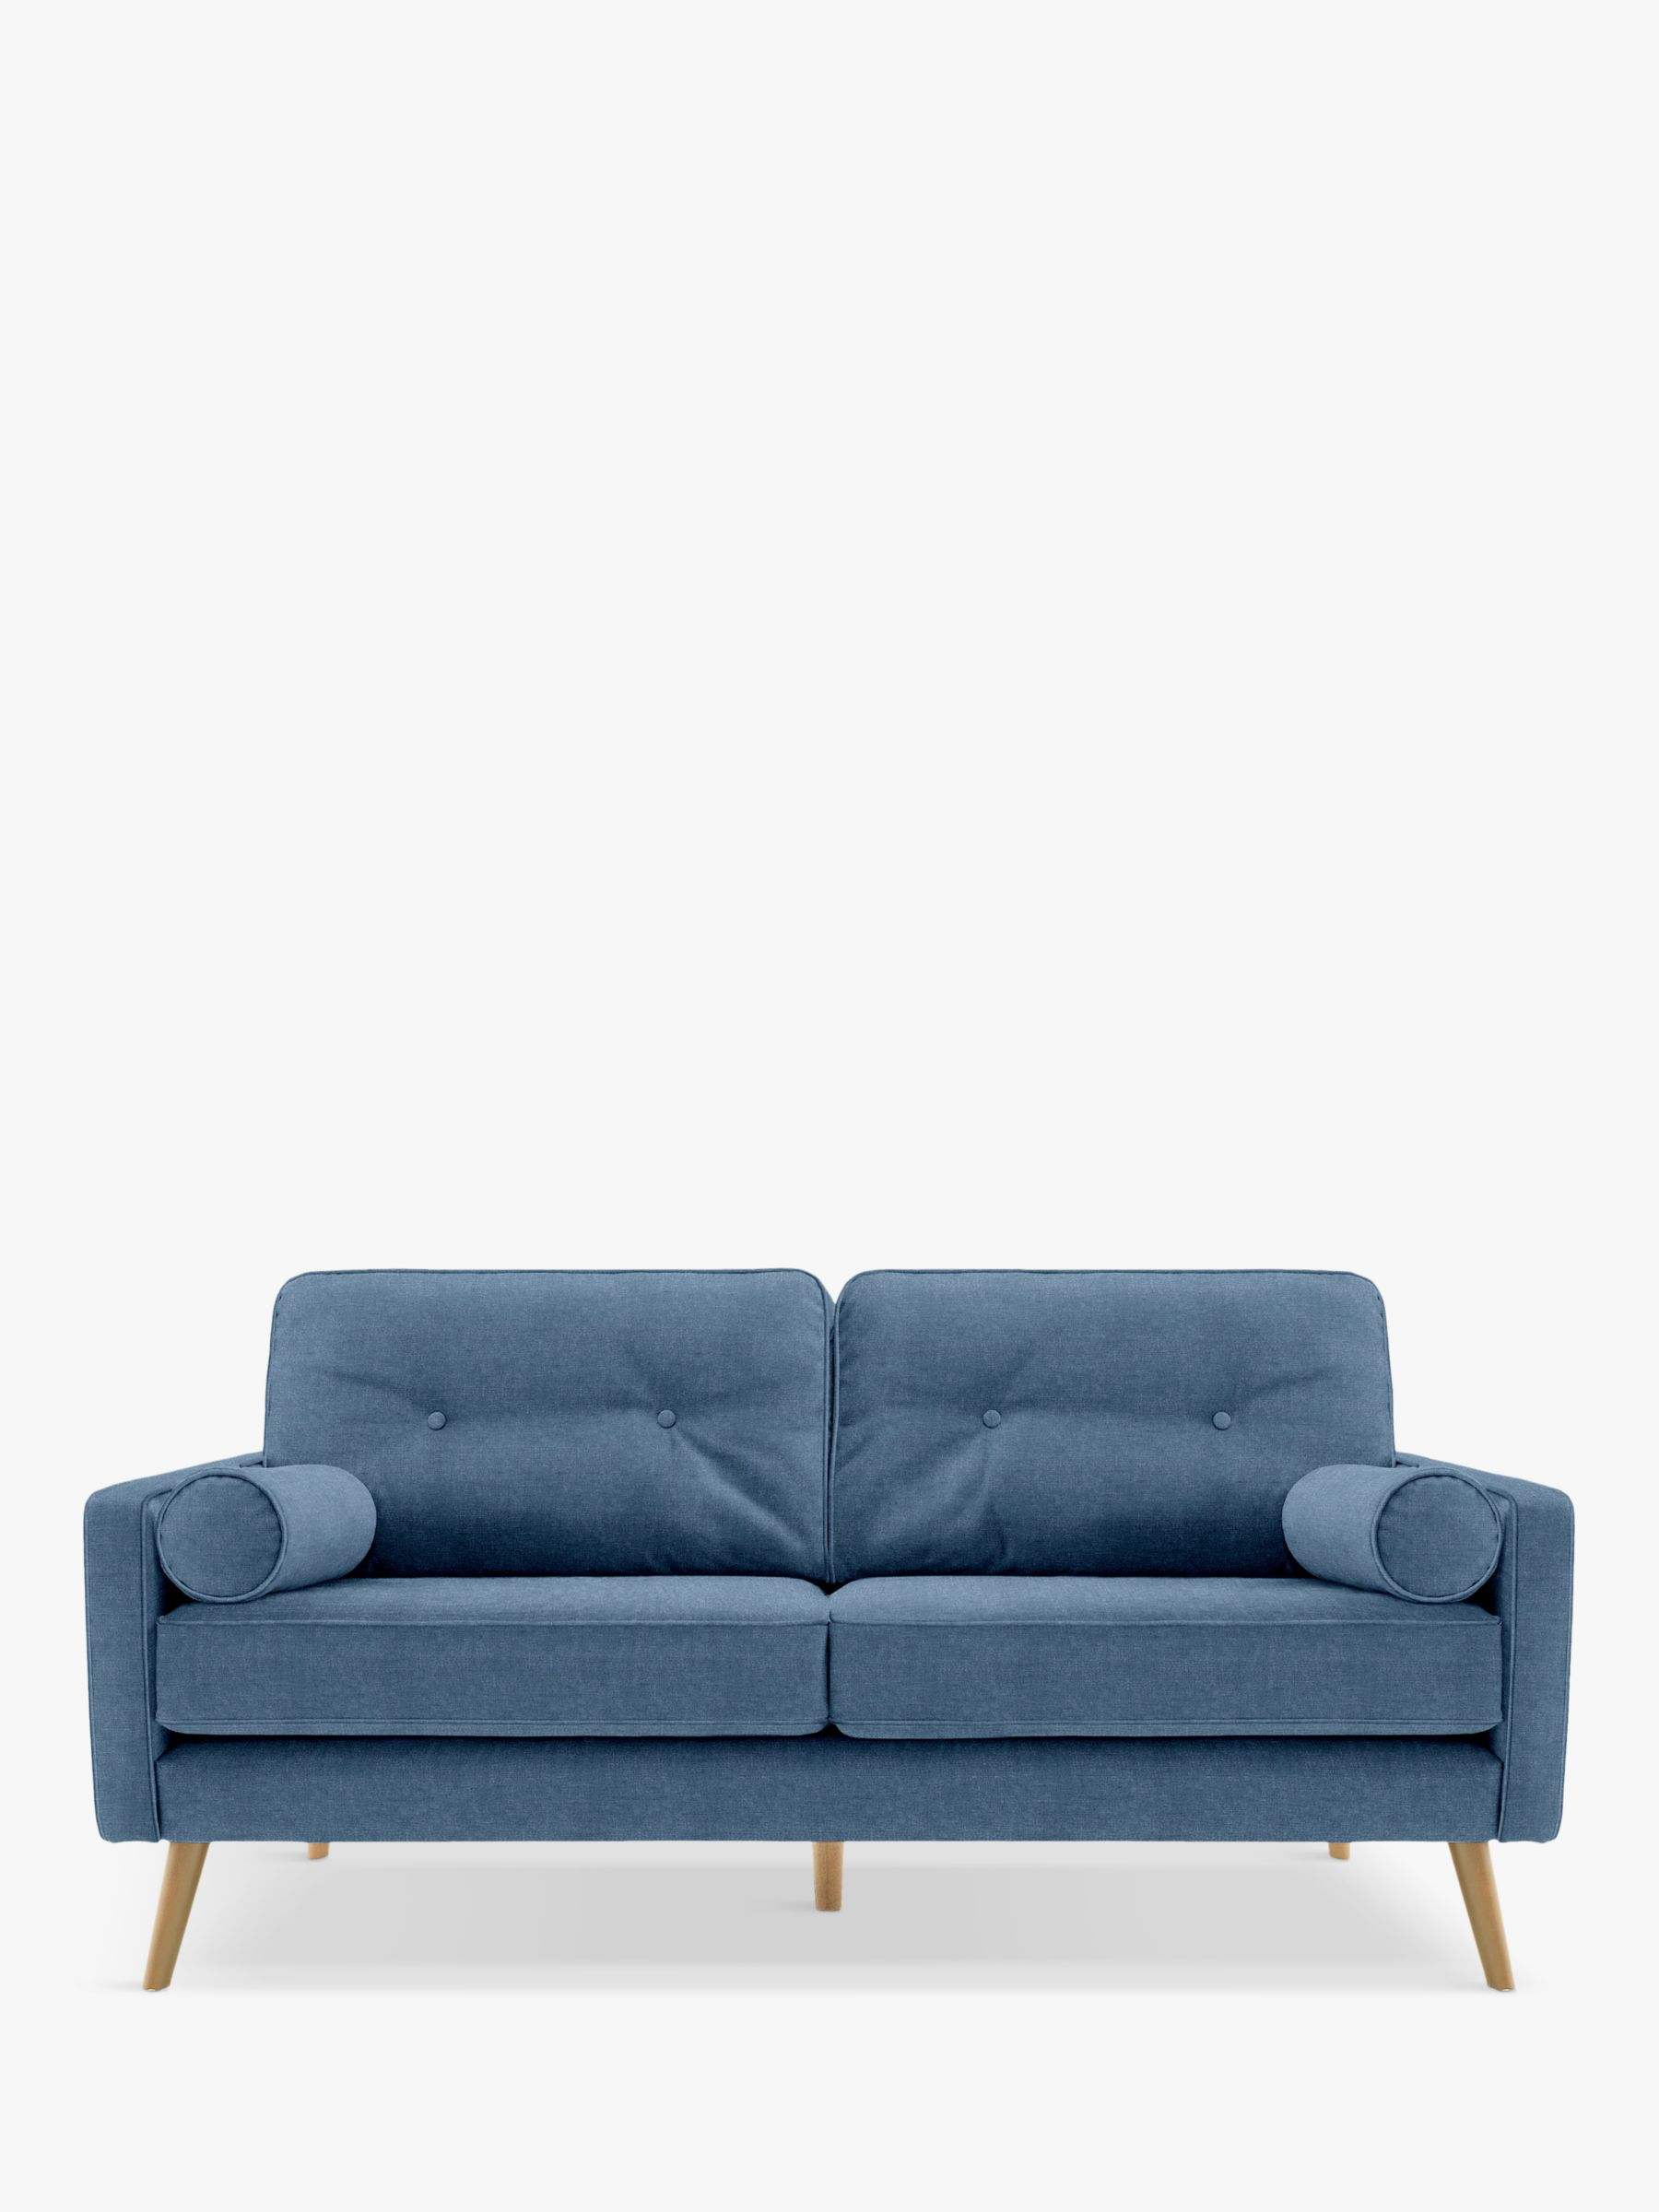 G Plan Vintage G Plan Vintage The Sixty Five Medium 2 Seater Sofa